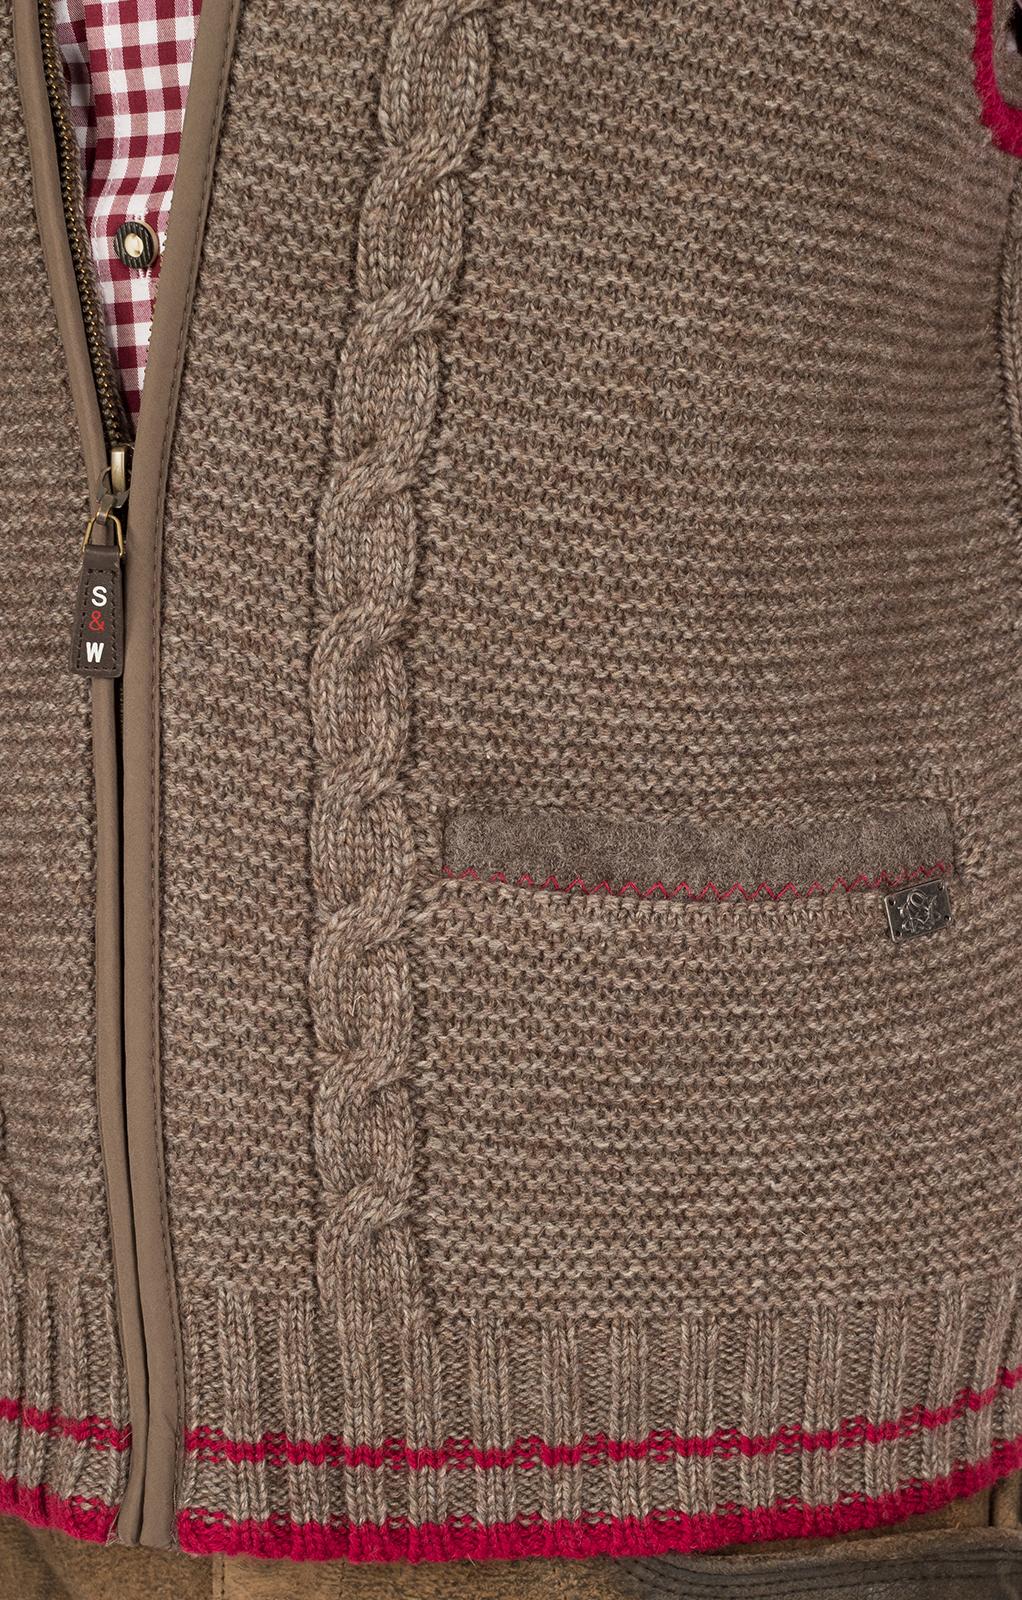 weitere Bilder von Gilet Costumi maglia marrone rosso